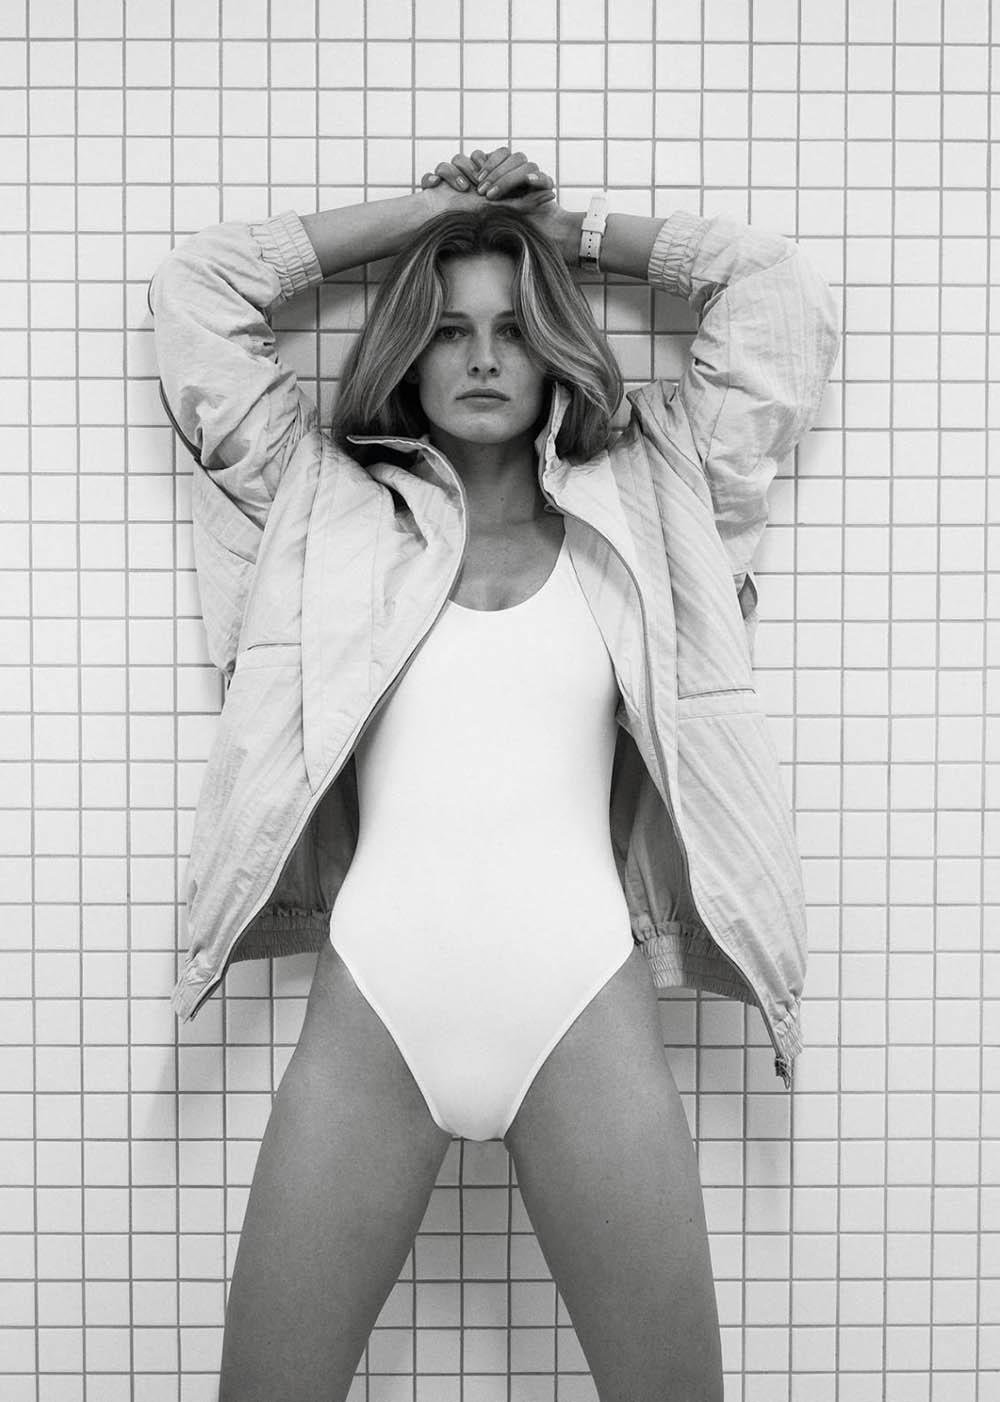 Edita Vilkeviciute by Bibi Cornejo Borthwick for Vogue Paris June July 2019